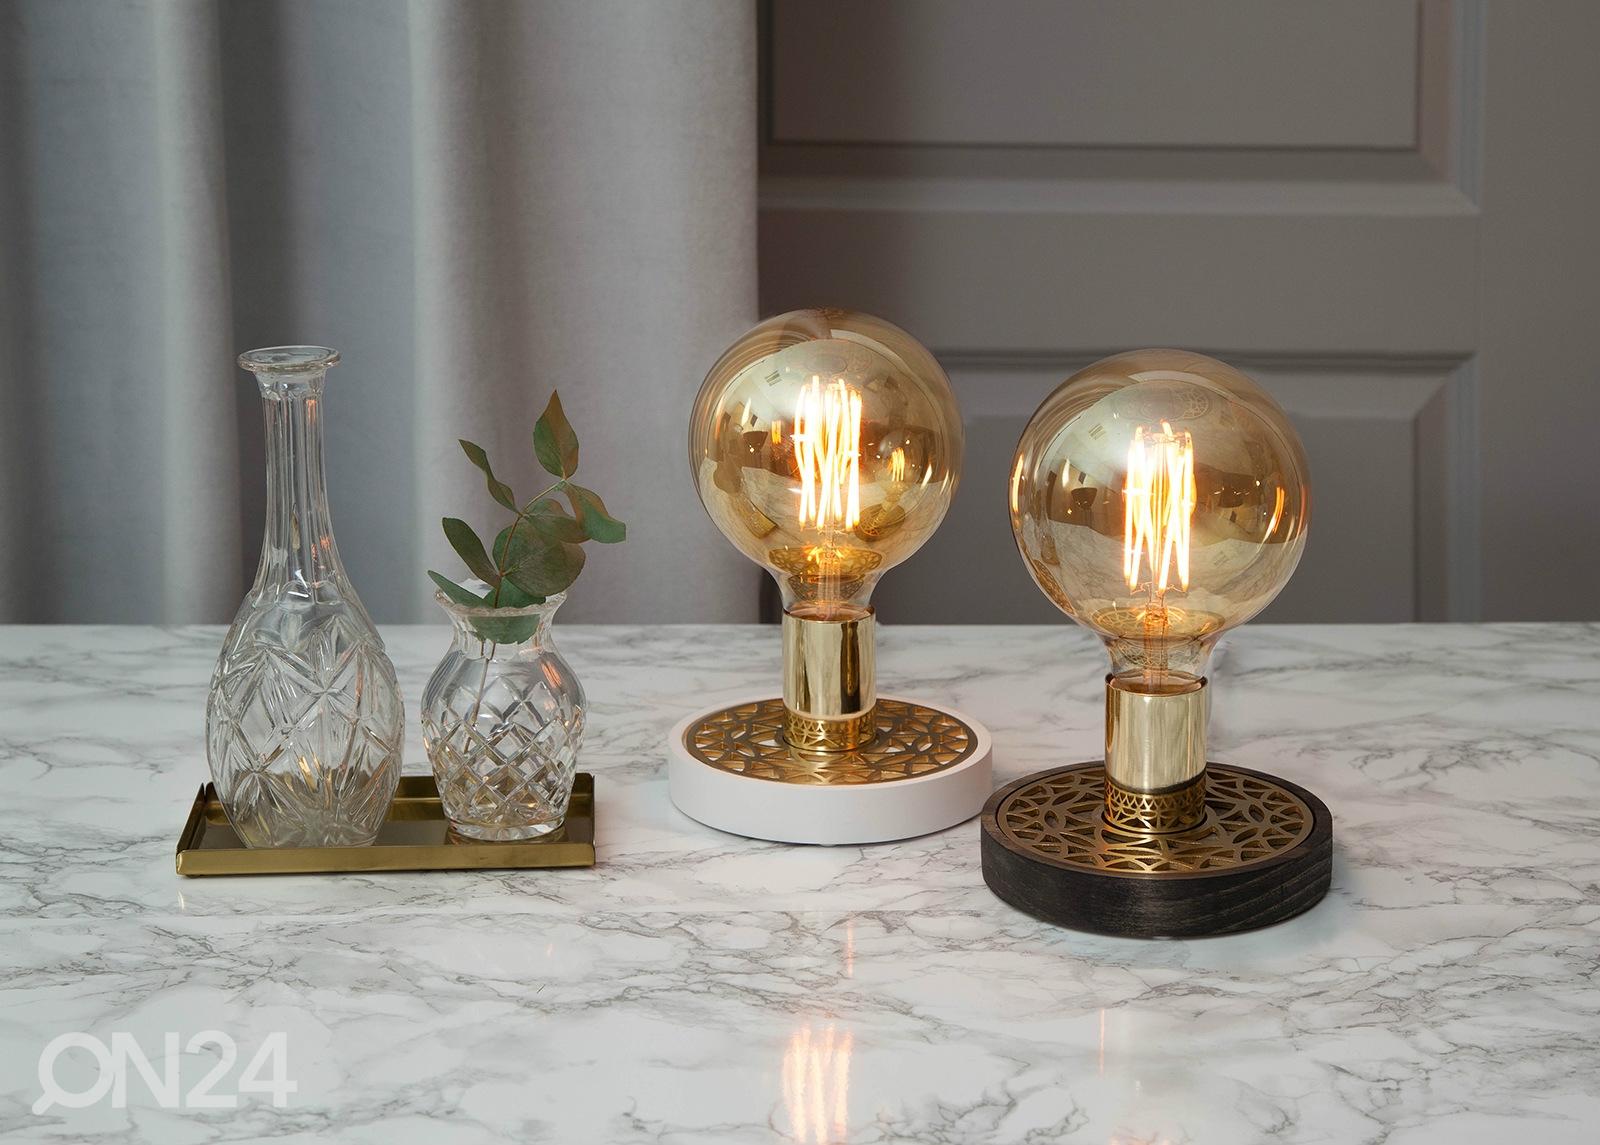 7e08fa3aafc Dekoratiivne LED pirn E27 3,7 W AA-152761 - ON24 Sisustuskaubamaja